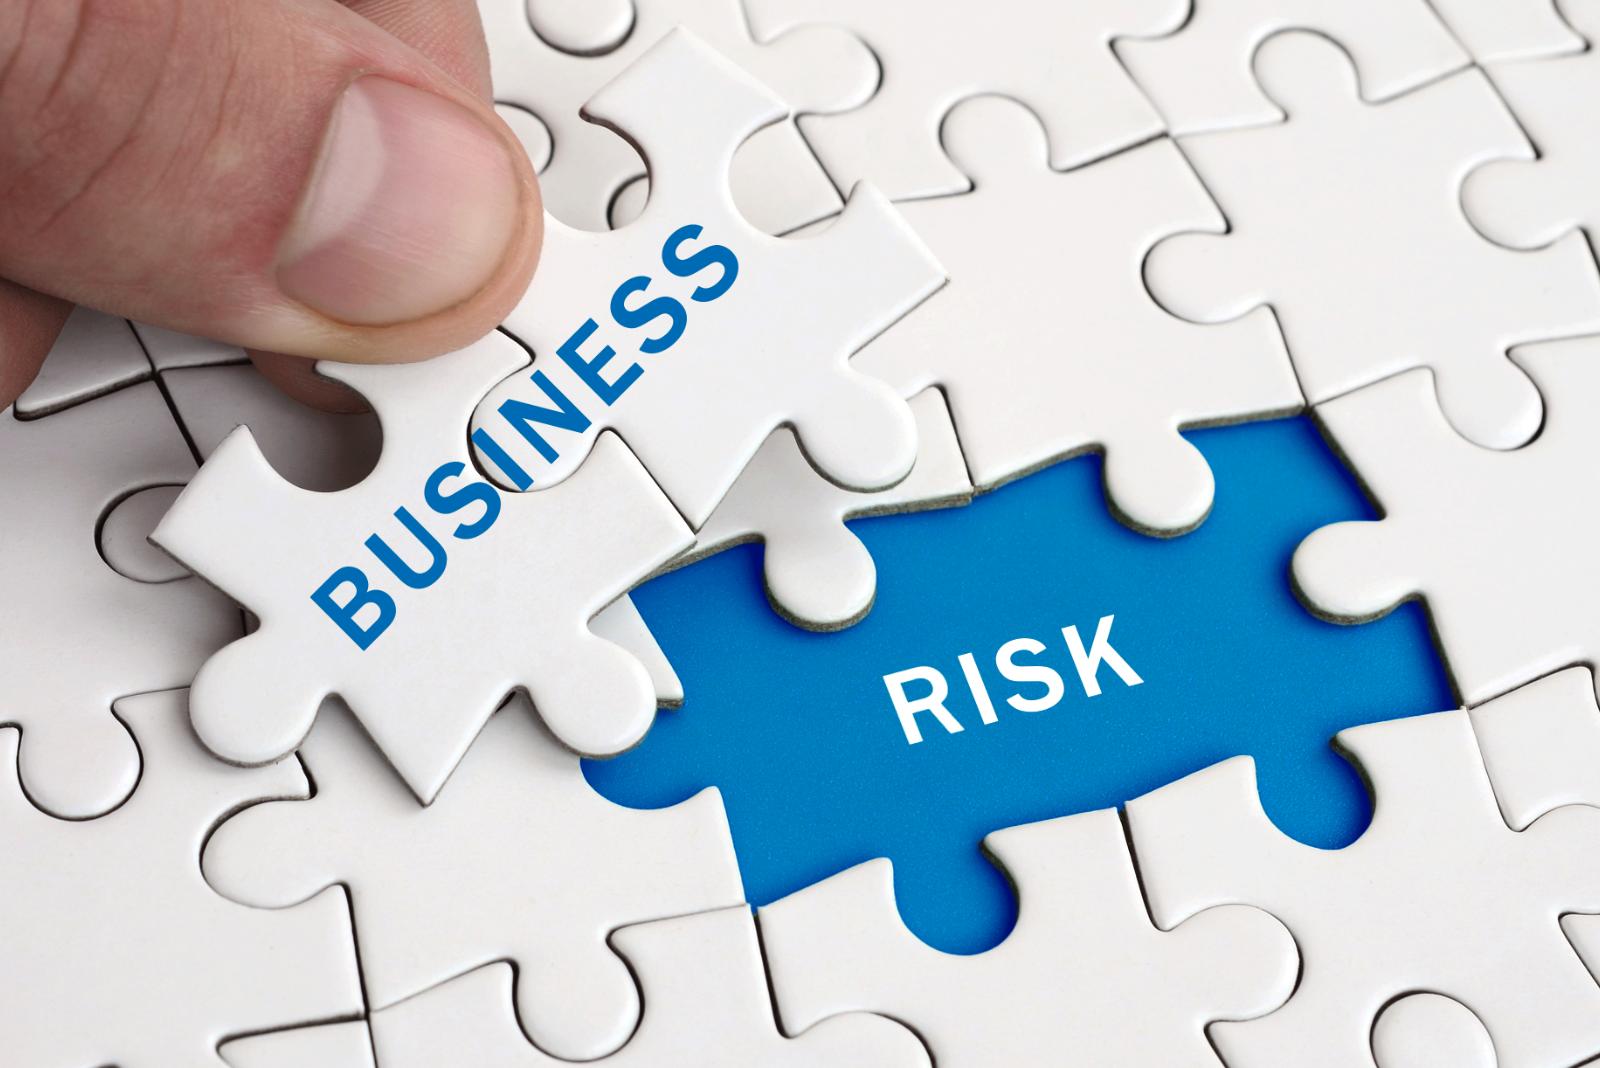 Risk Management Software - Guide for Businesses in Australia